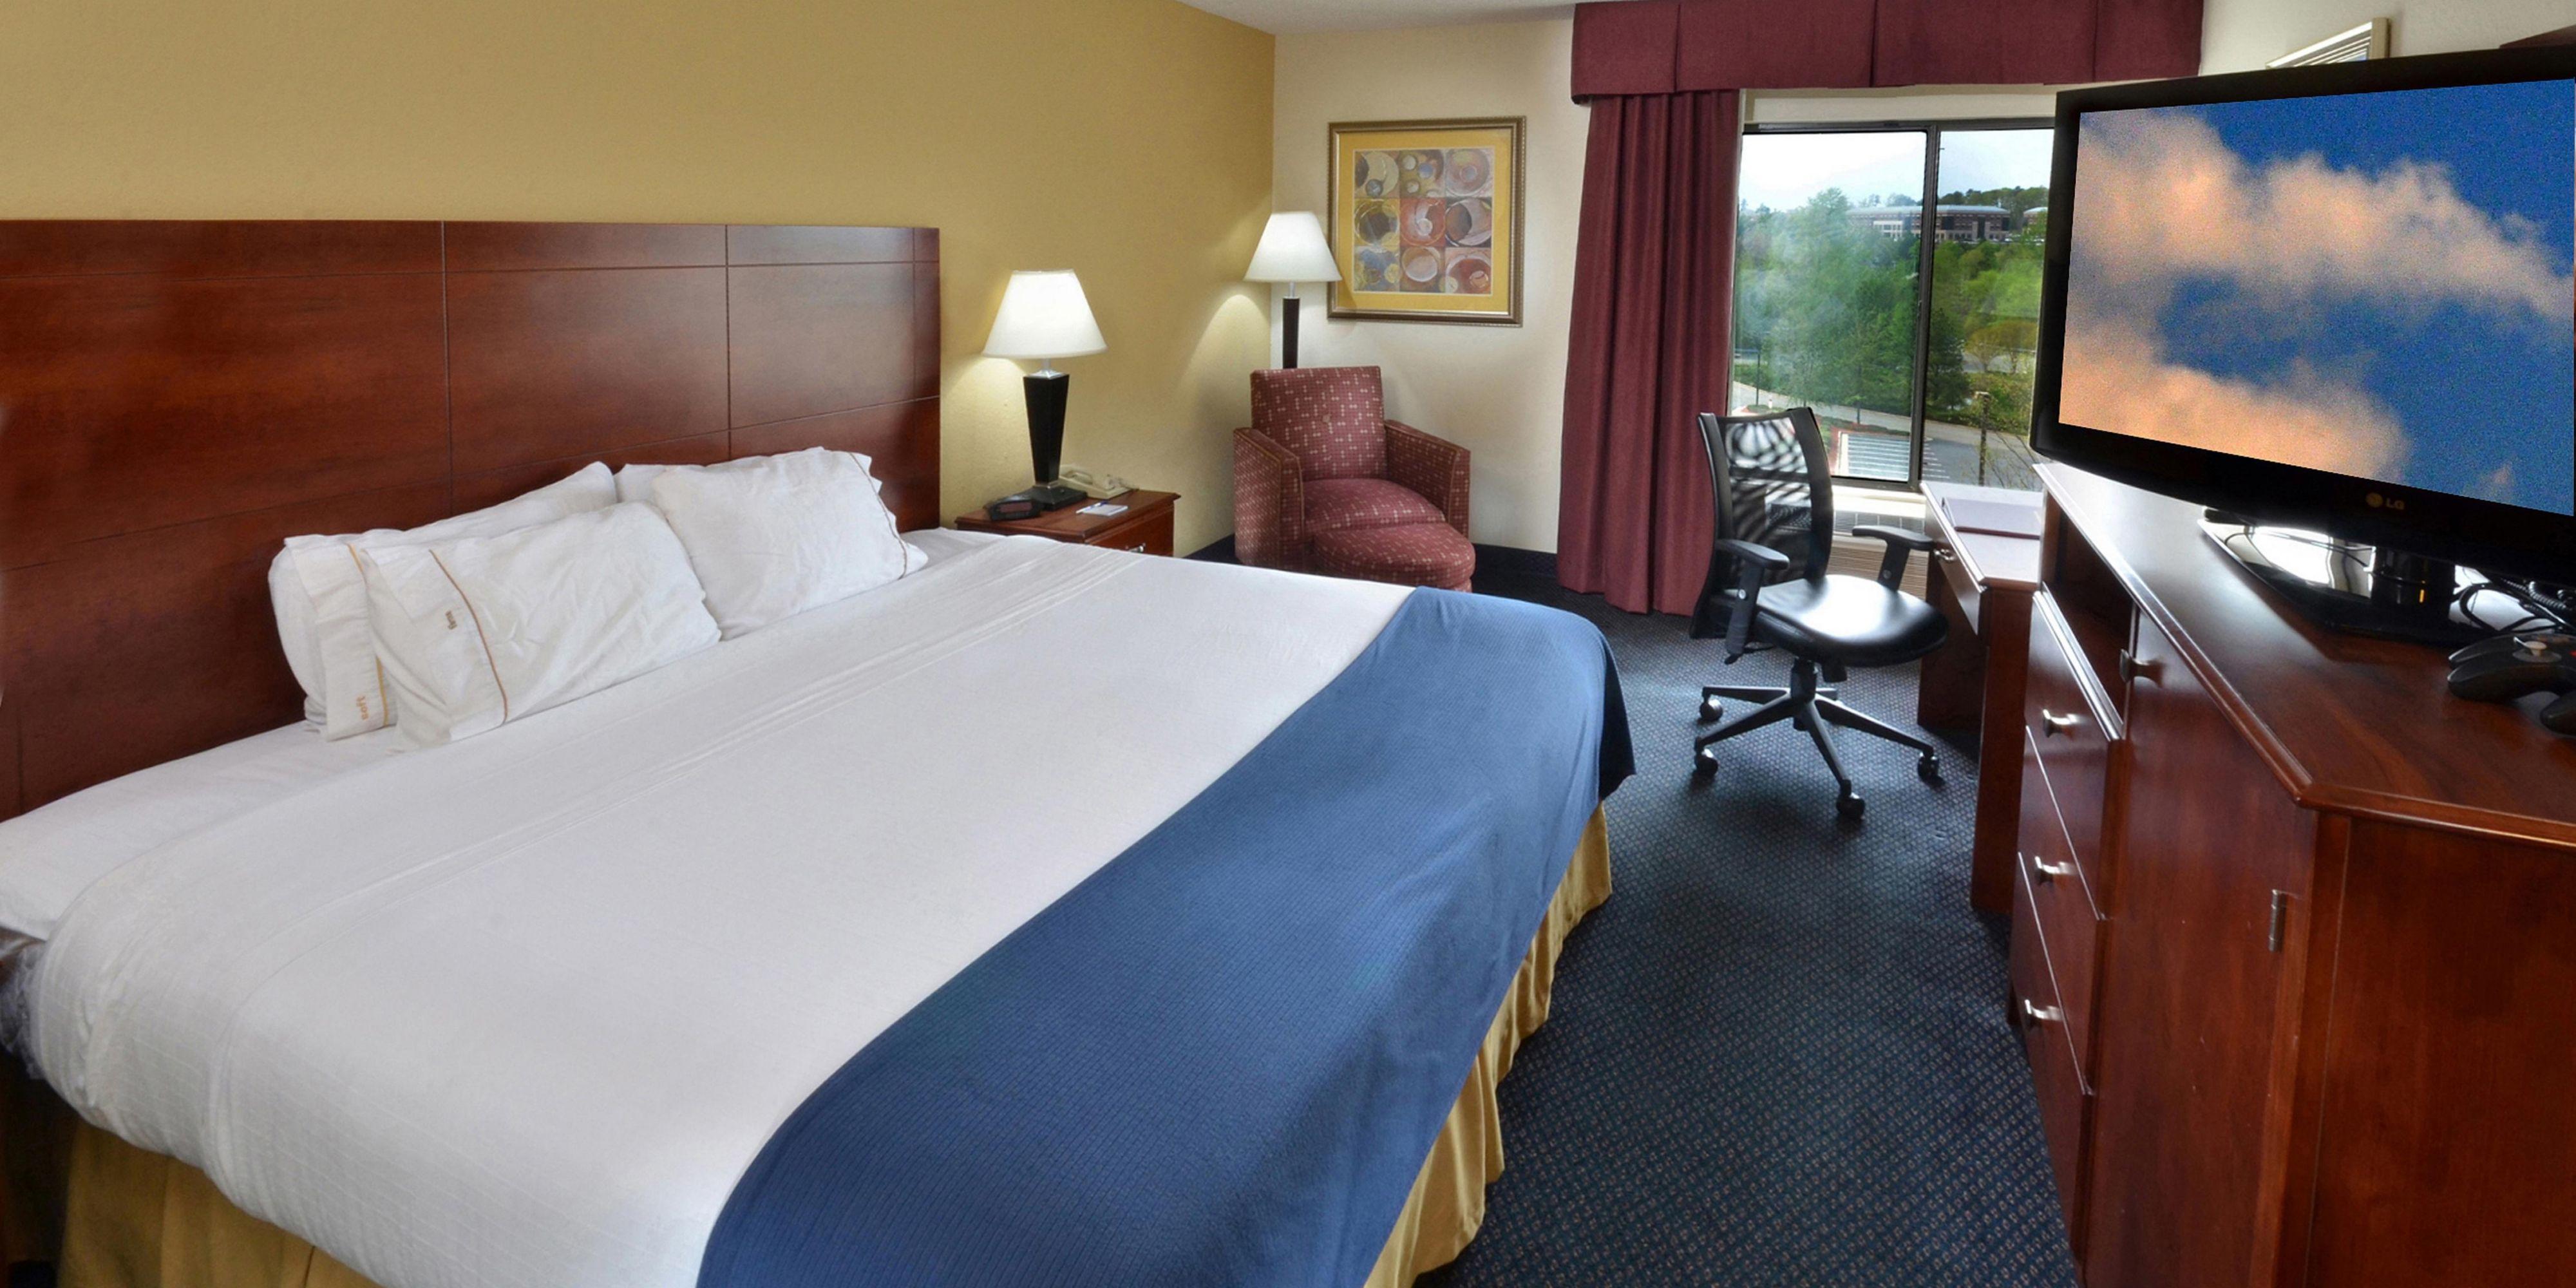 holiday inn express richmond i 64 short pump area hotel by ihg holiday inn express richmond 3493079719 2x1